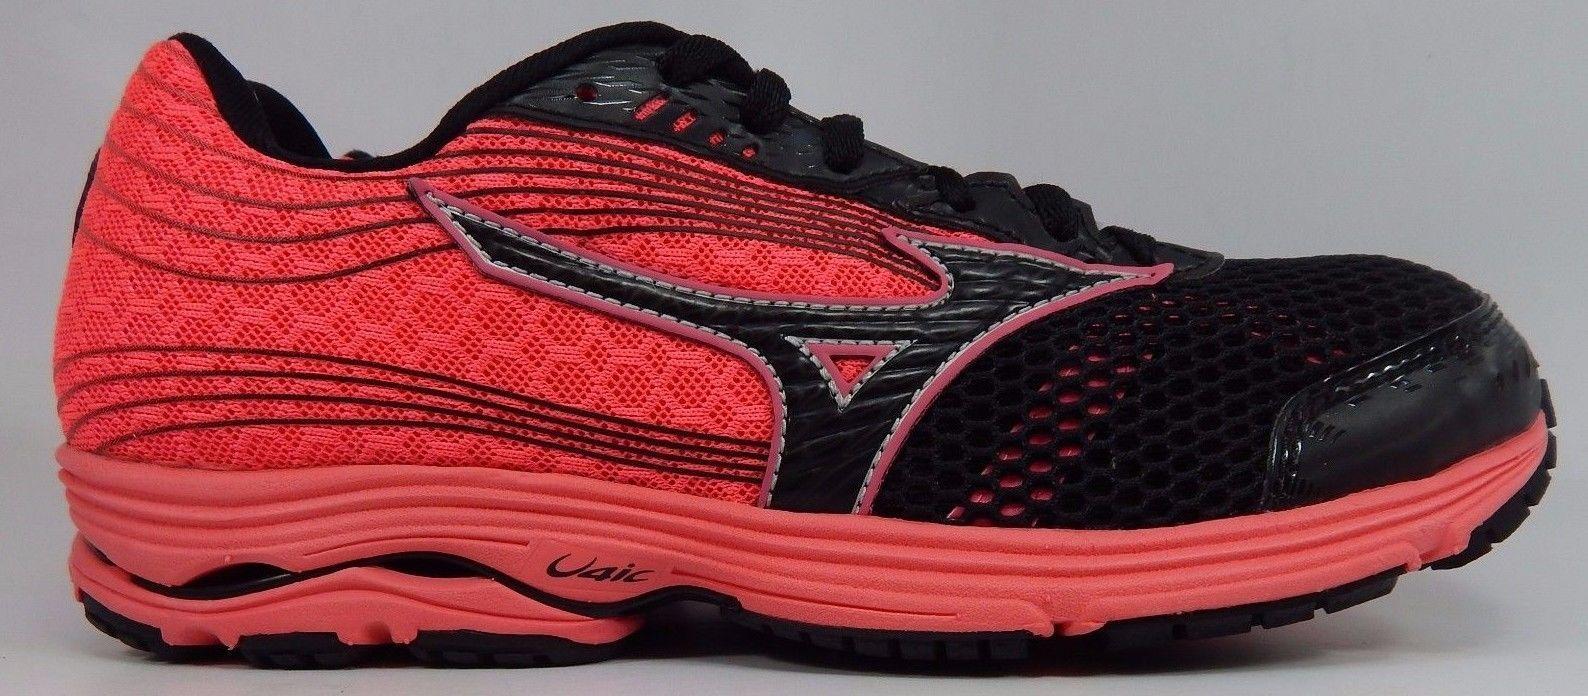 Mizuno Wave Sayonara 3 Women's Running Shoes Size US 8 M (B) EU 38.5 Pink Black